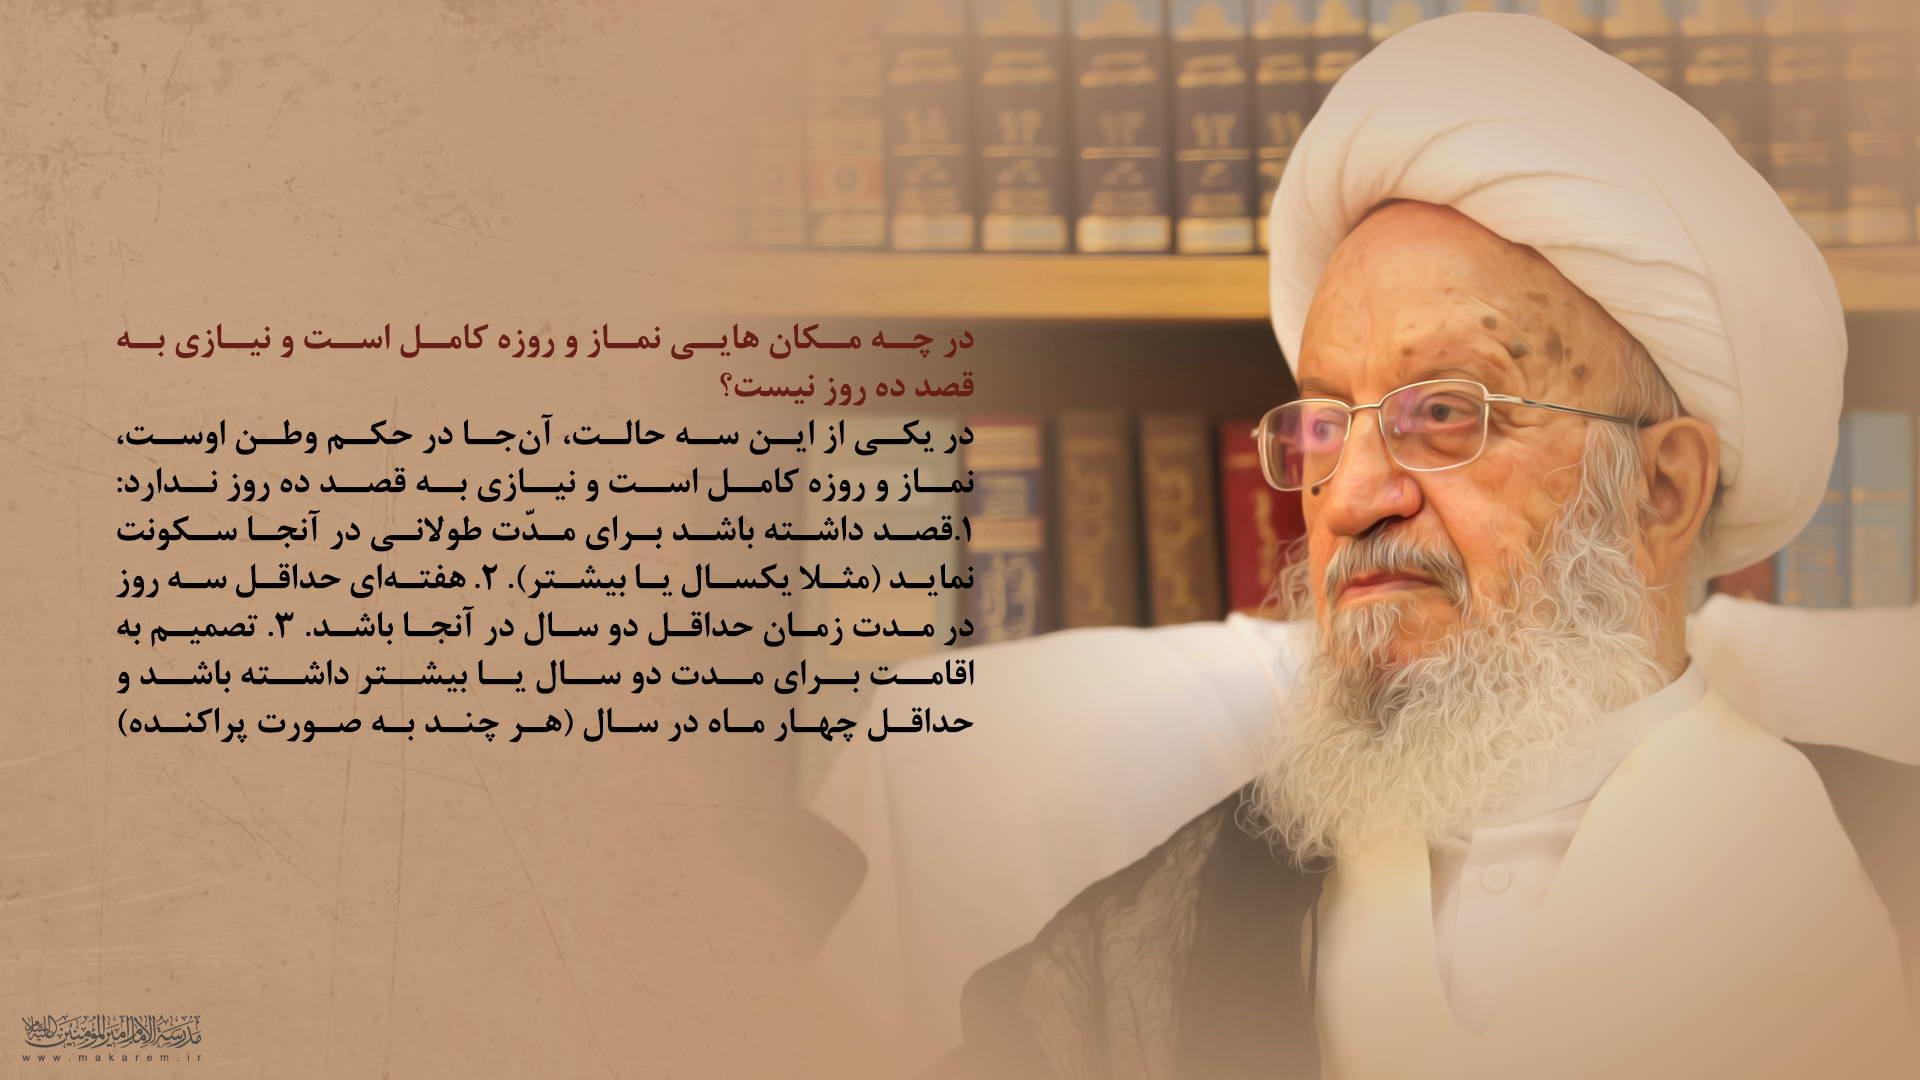 کثیر 01-مدرسه الامام امیر المومنین (ع)